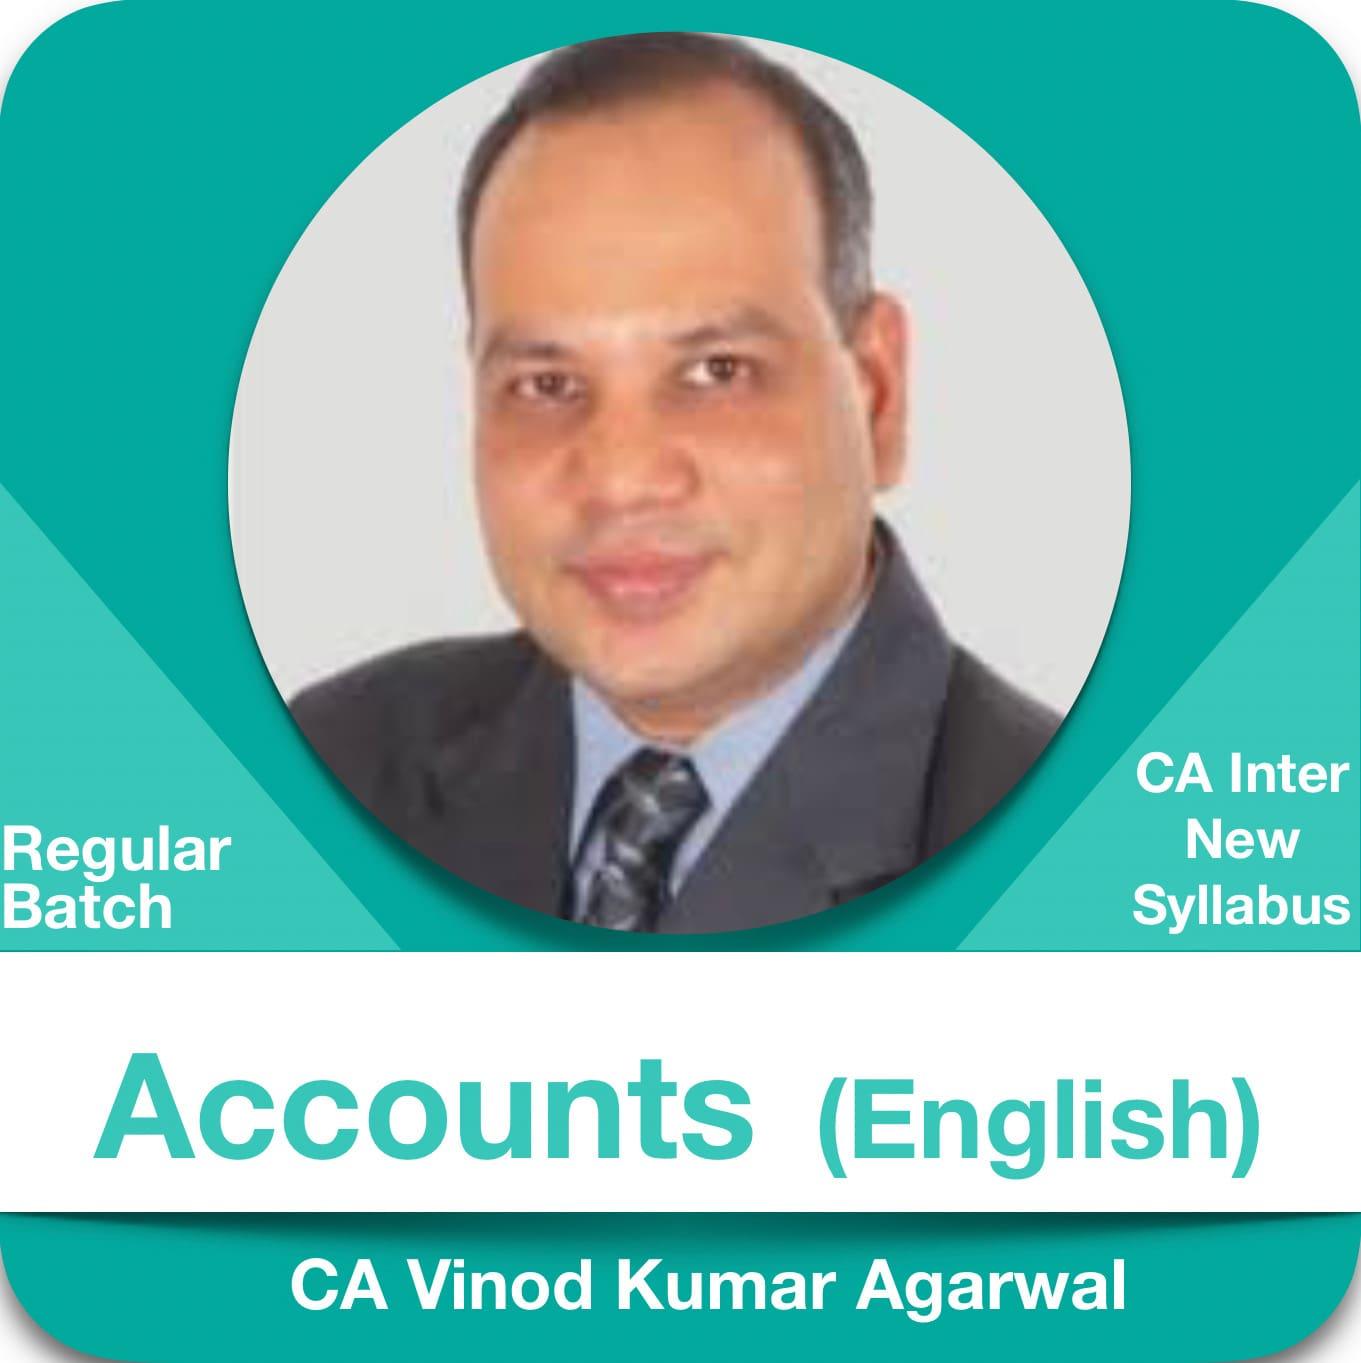 Accounts (1.2 & 3 Views) Regular Batch in English